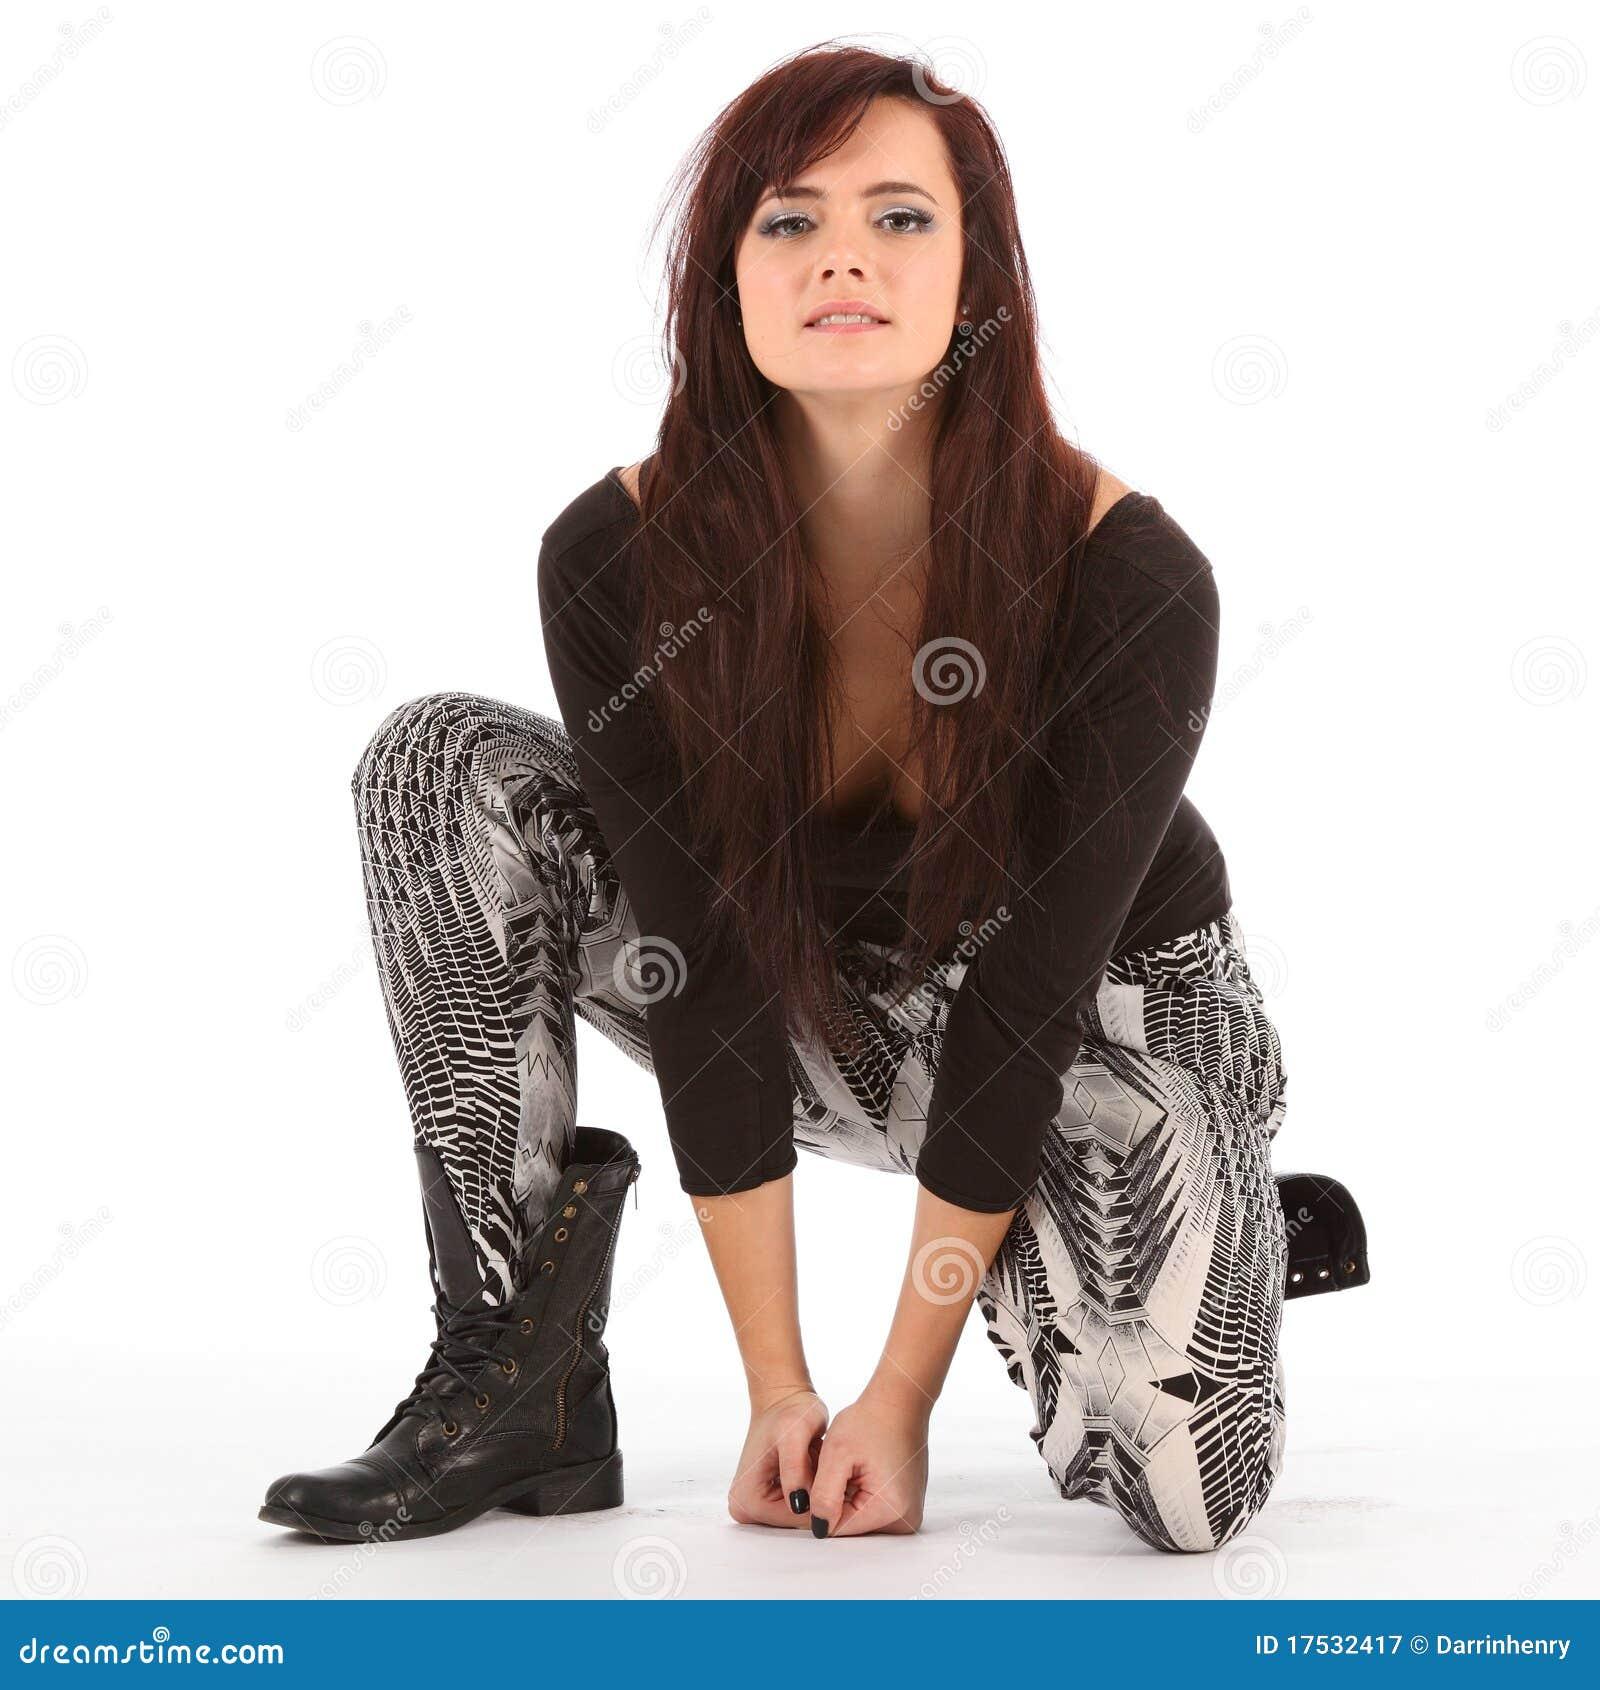 Modern Urban Black Girl: Young Urban Dance Girl In Black Boots Kneeling Stock Image